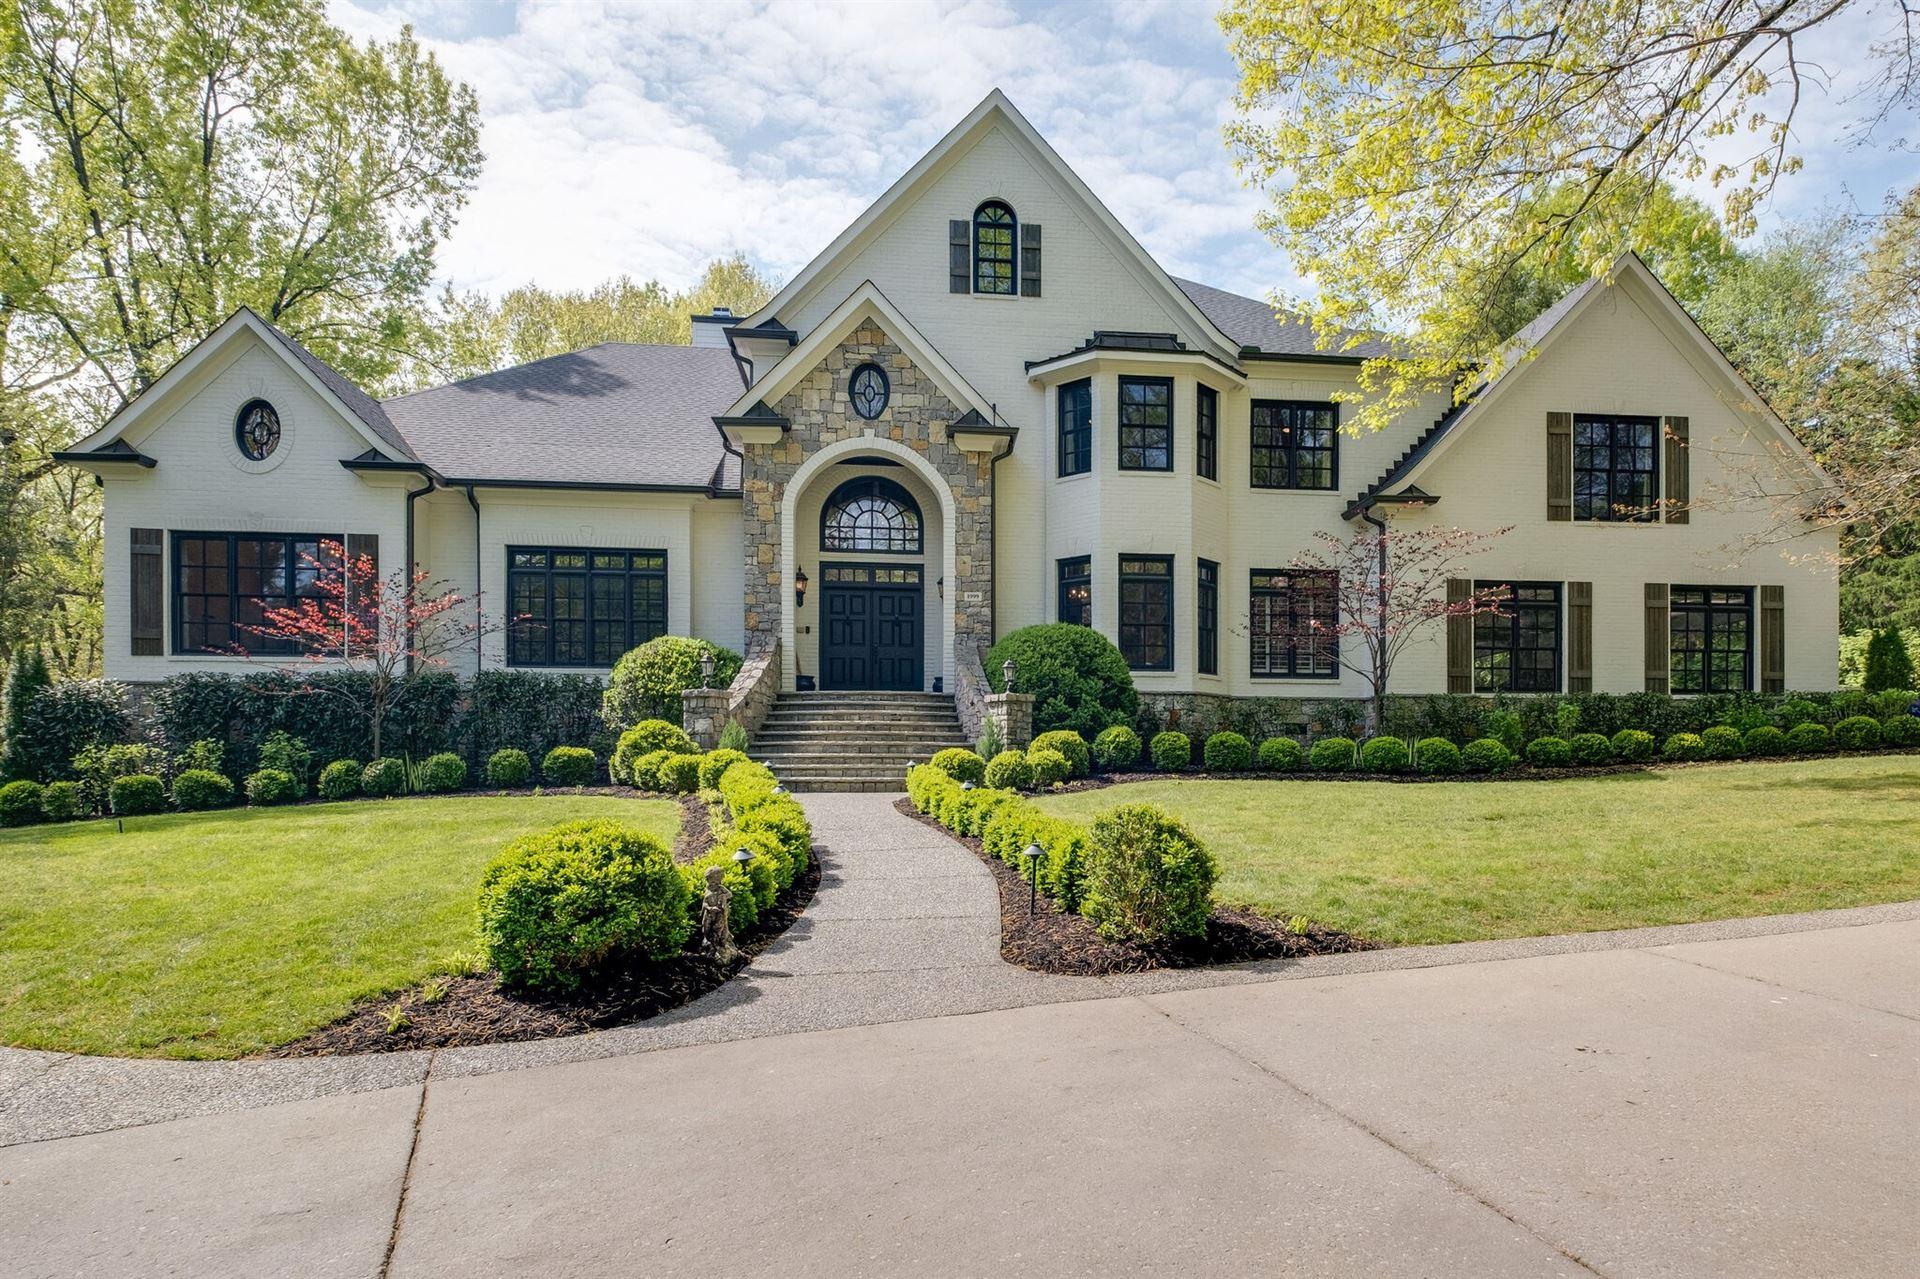 Photo of 23 Bancroft Place, Nashville, TN 37215 (MLS # 2248065)